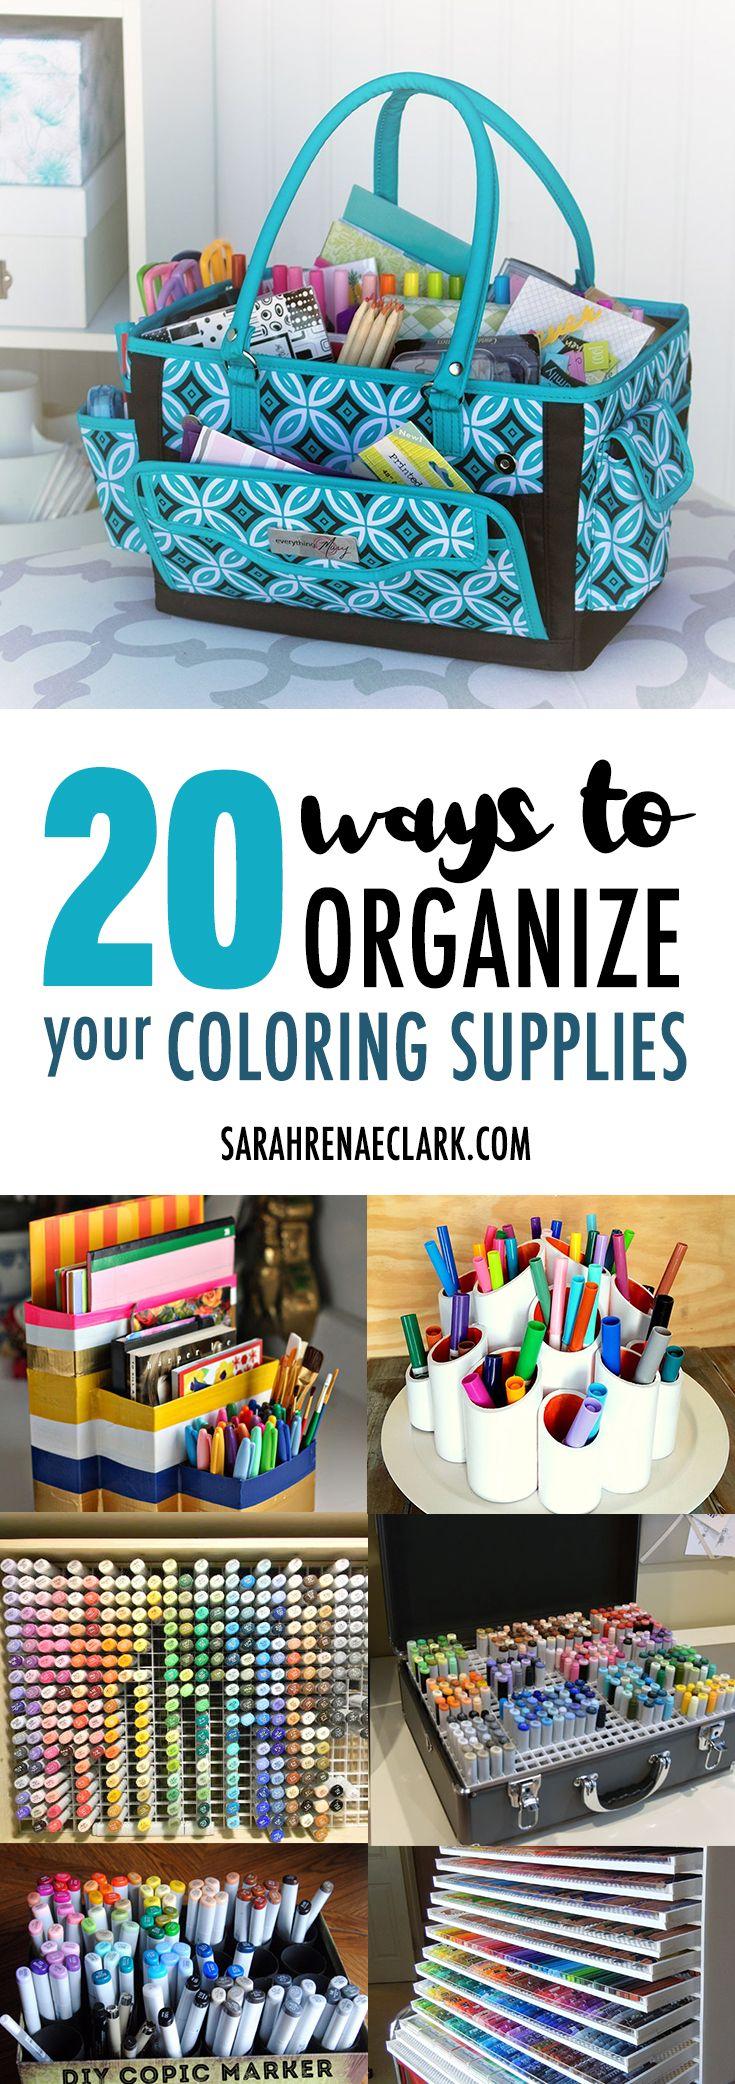 20 Clever Ways To Organize Your Coloring Supplies Pen Storage Diy Art Supplies Storage Marker Storage